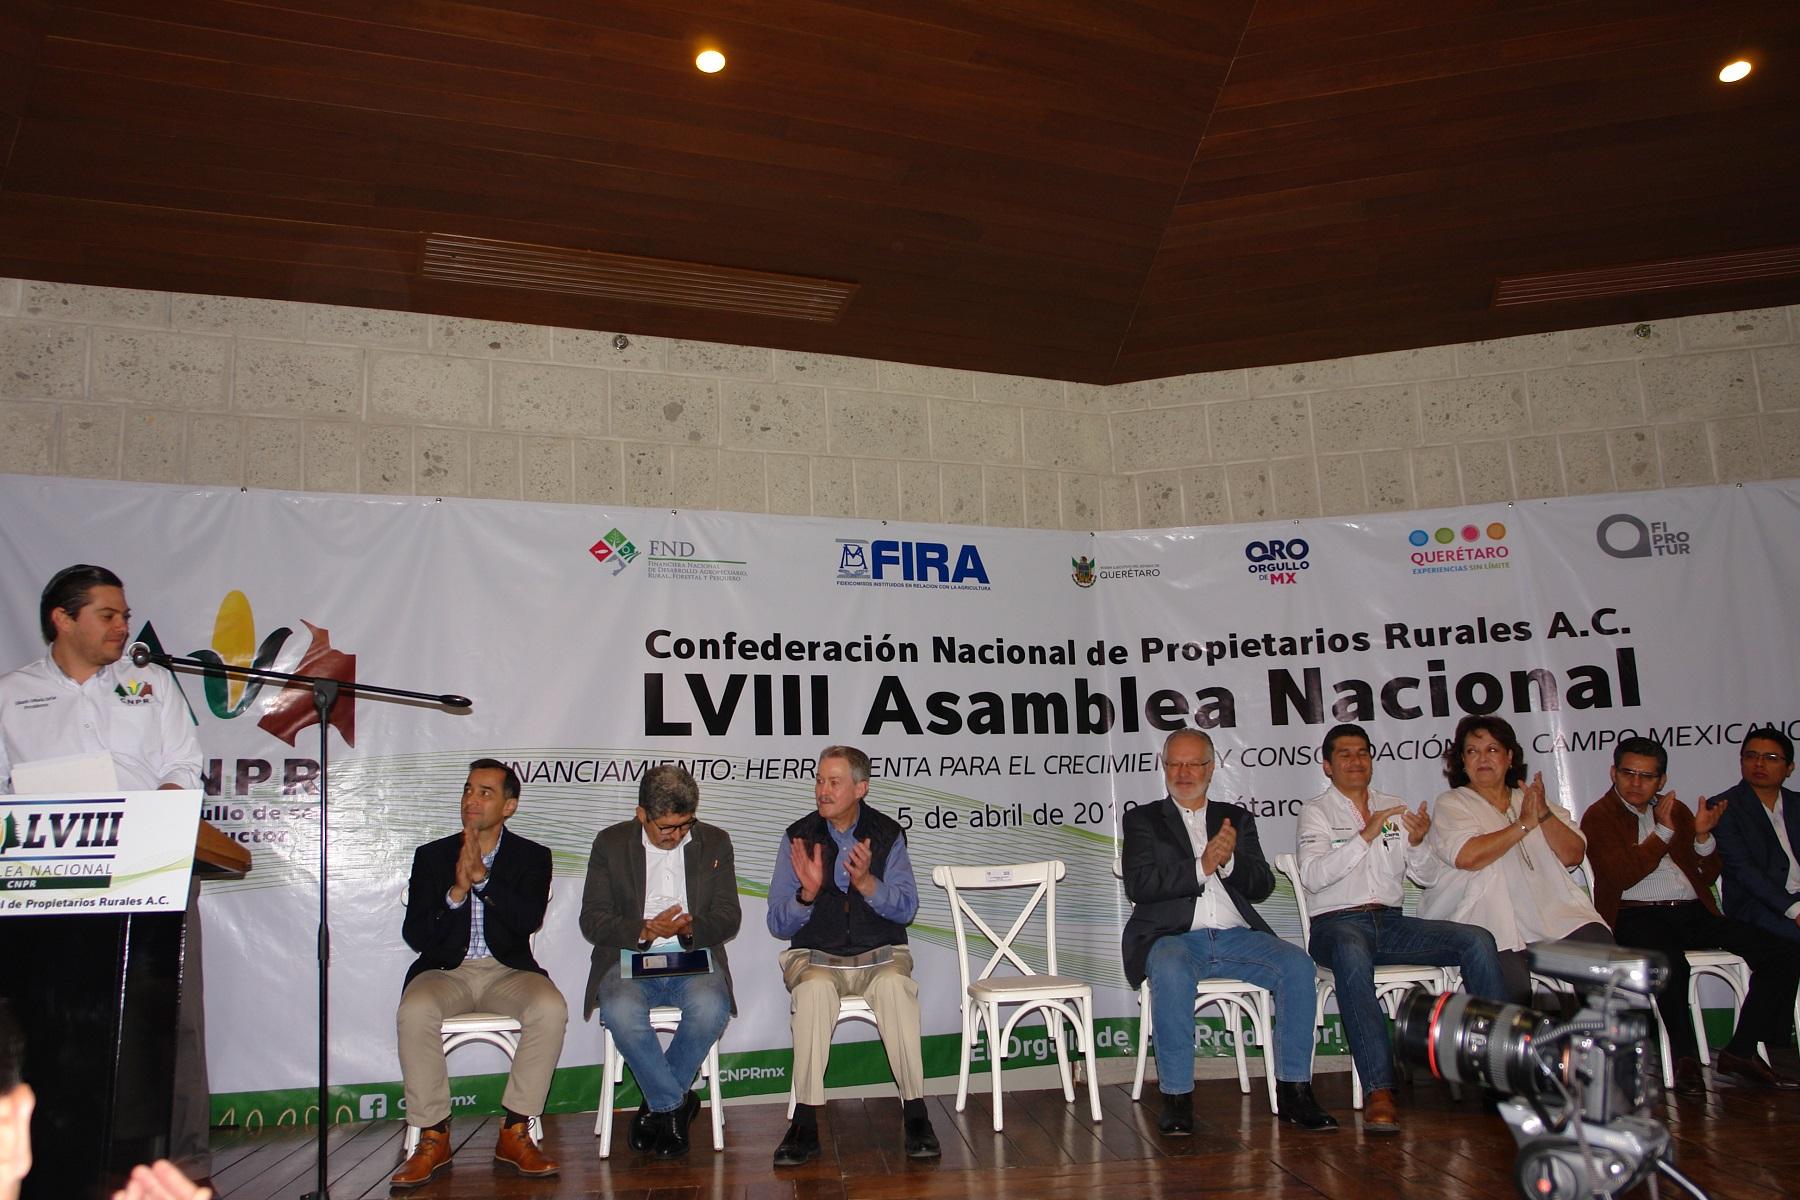 AGROASEMEX en Asamblea Nacional de la CNPR.